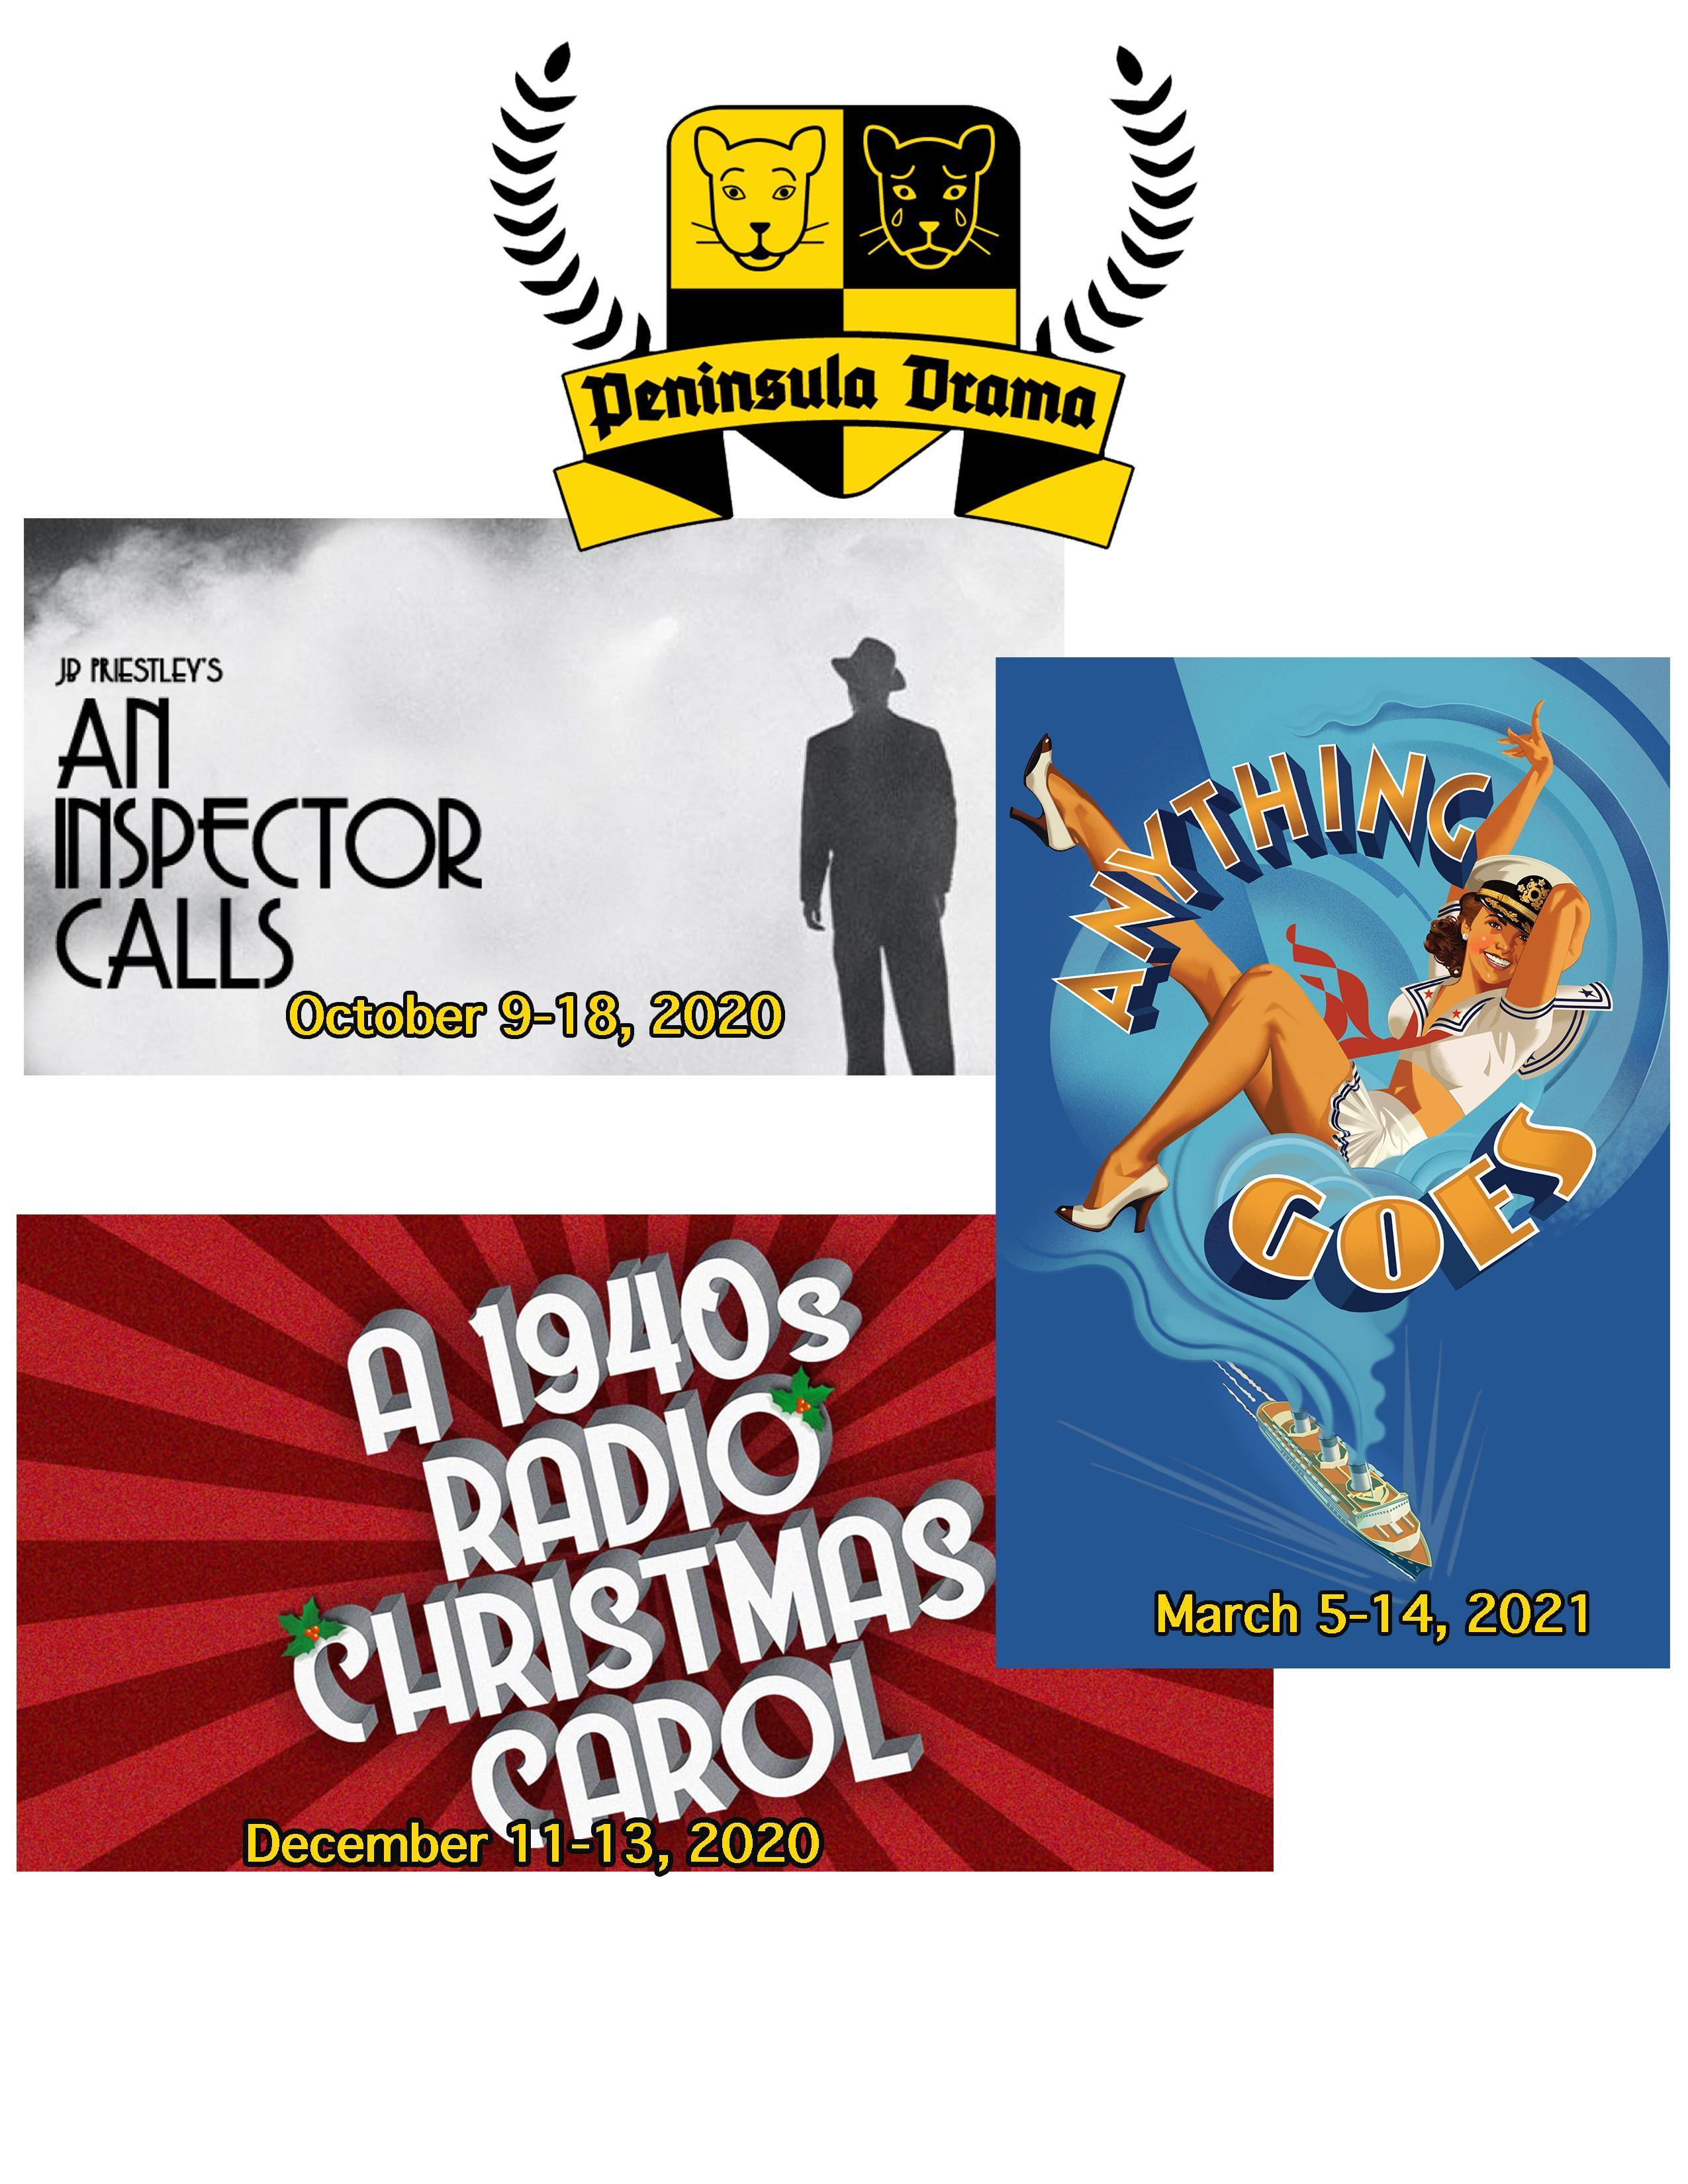 Next season, An Inspector Calls; A 1940s Radio Christmas Carol and Anything Goes